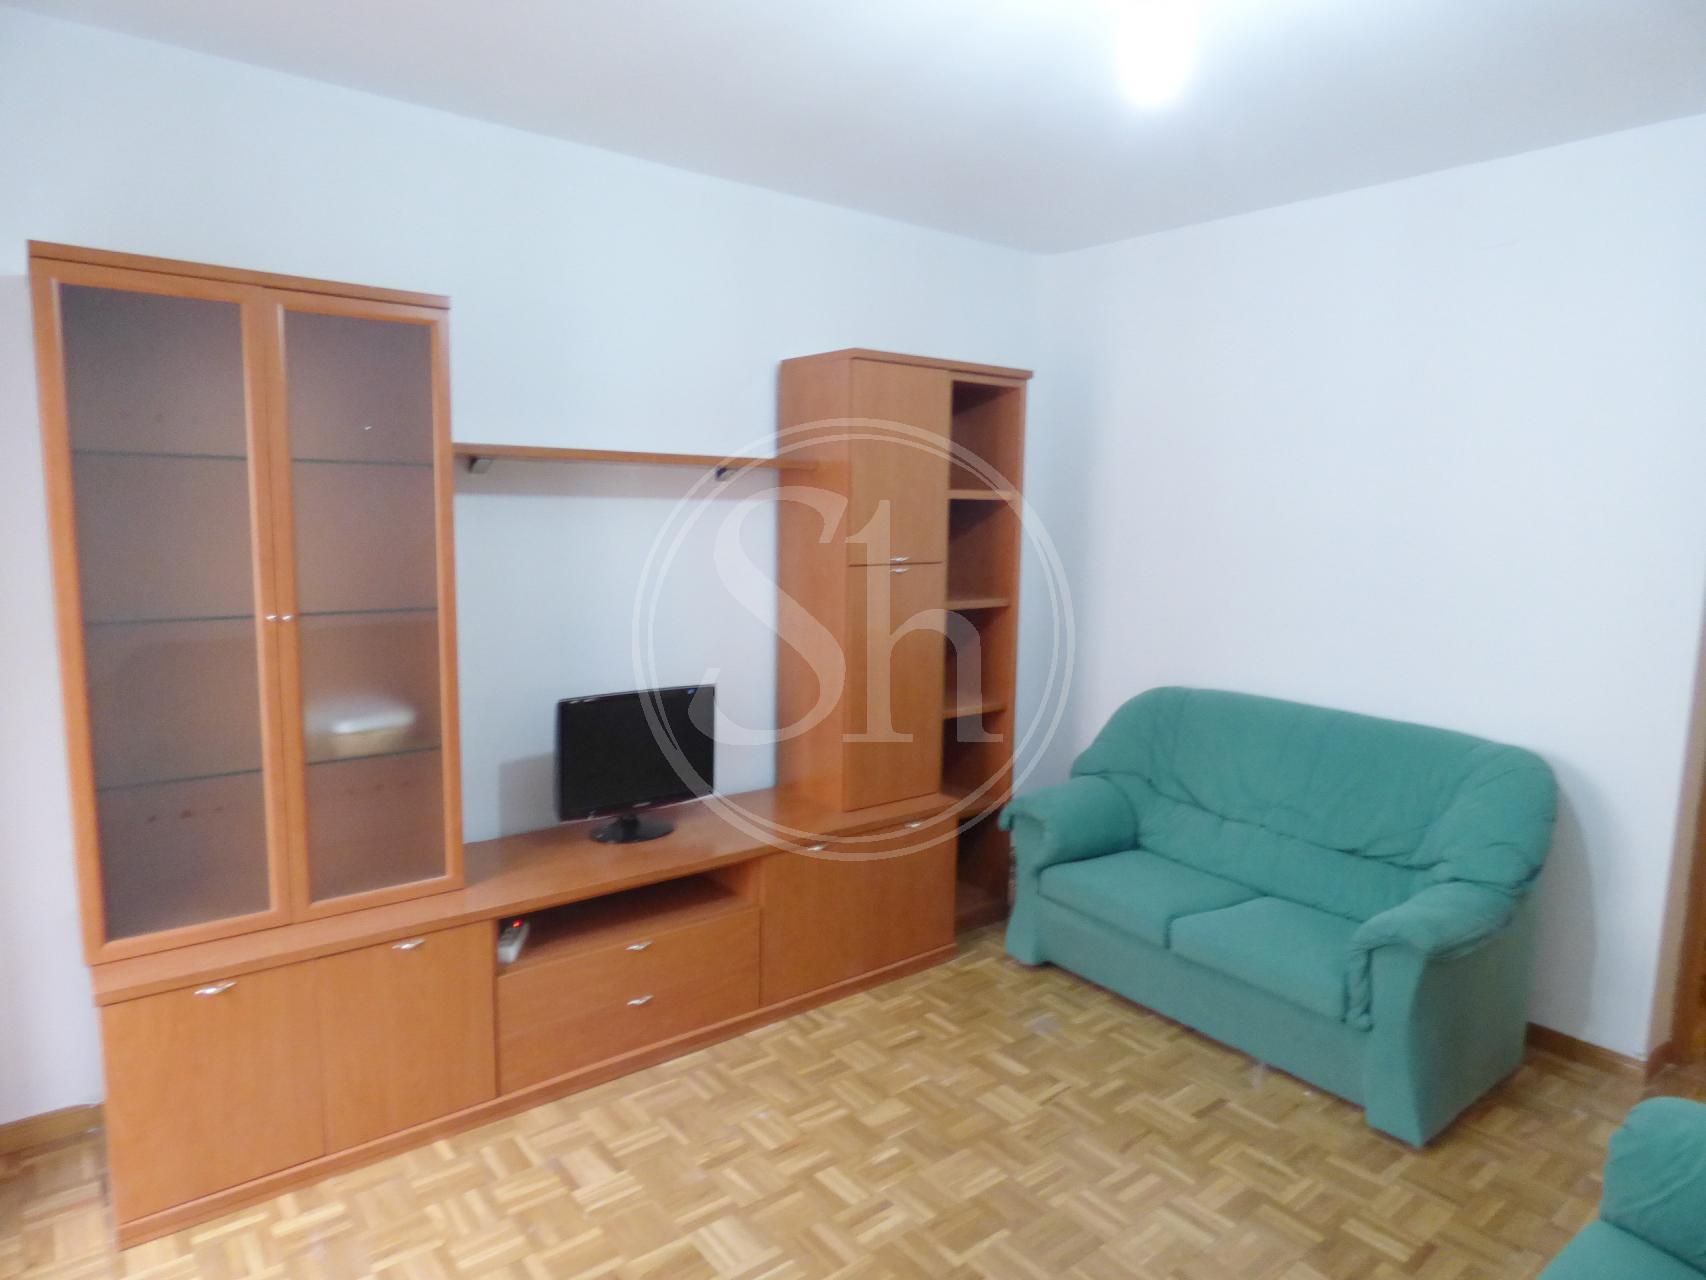 Apartment For Rent Madrid Ciudad Lineal Alcala Ciudad Lineal